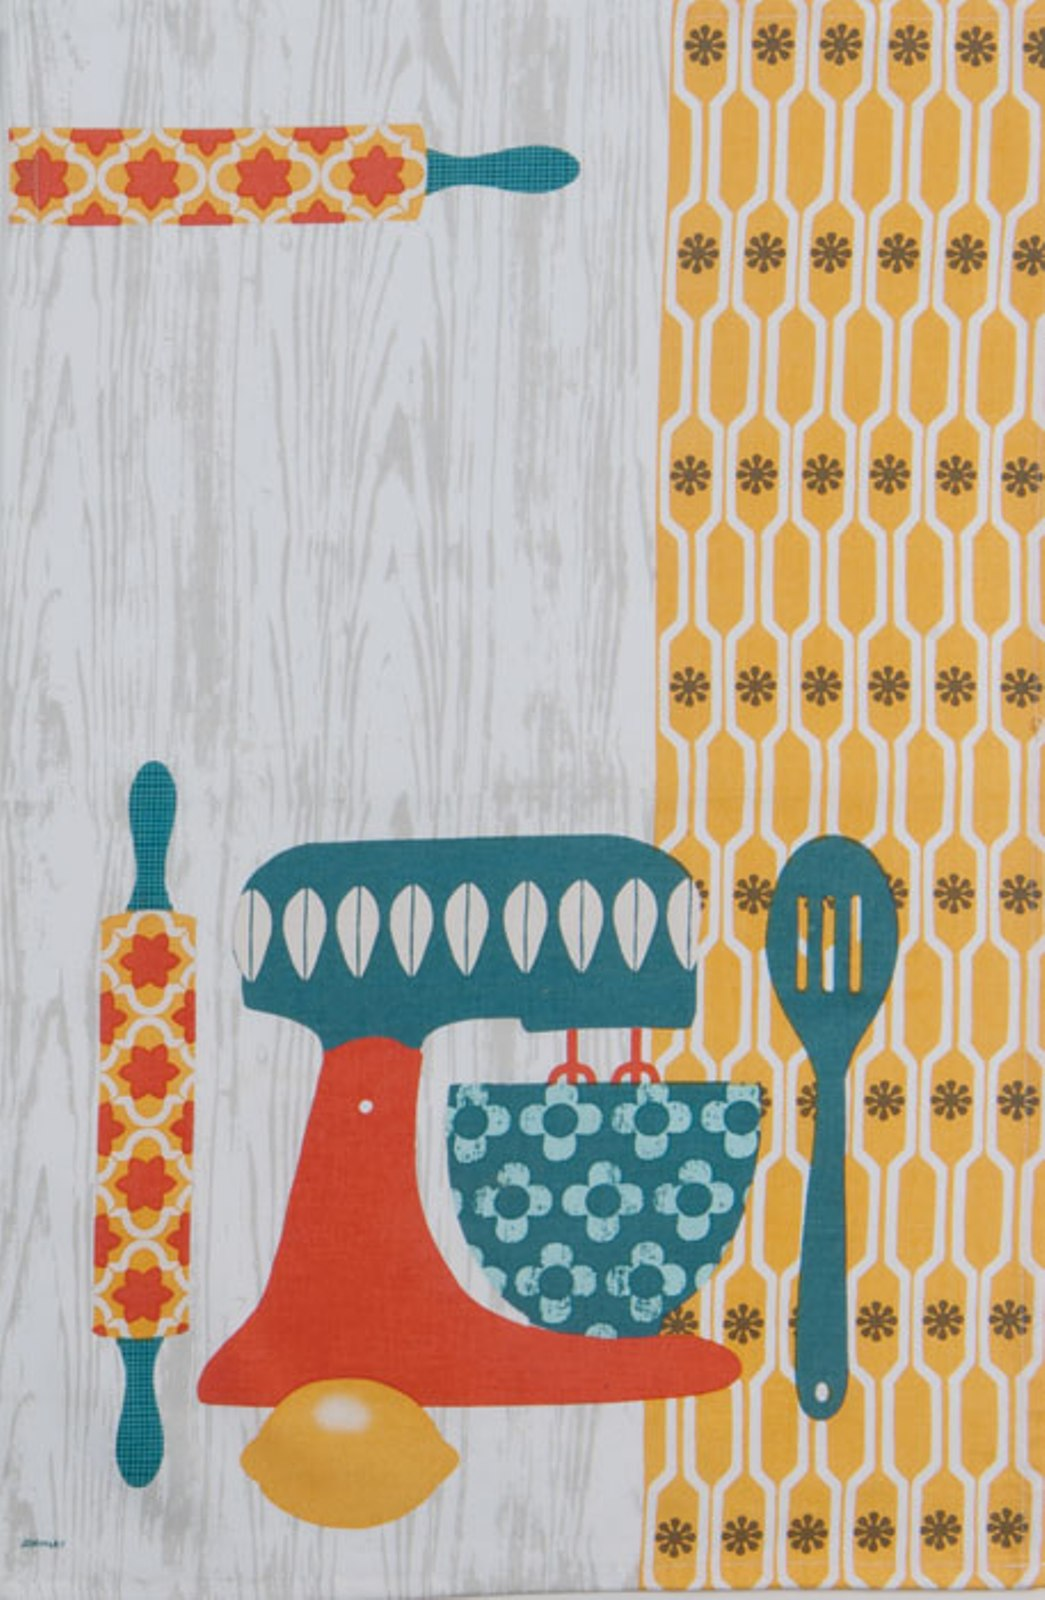 Kay Dee Retro Print Mixing Bowl Mixer 28 Inch Kitchen Dish Tea Towel Cotton Kay Dee at Sears.com